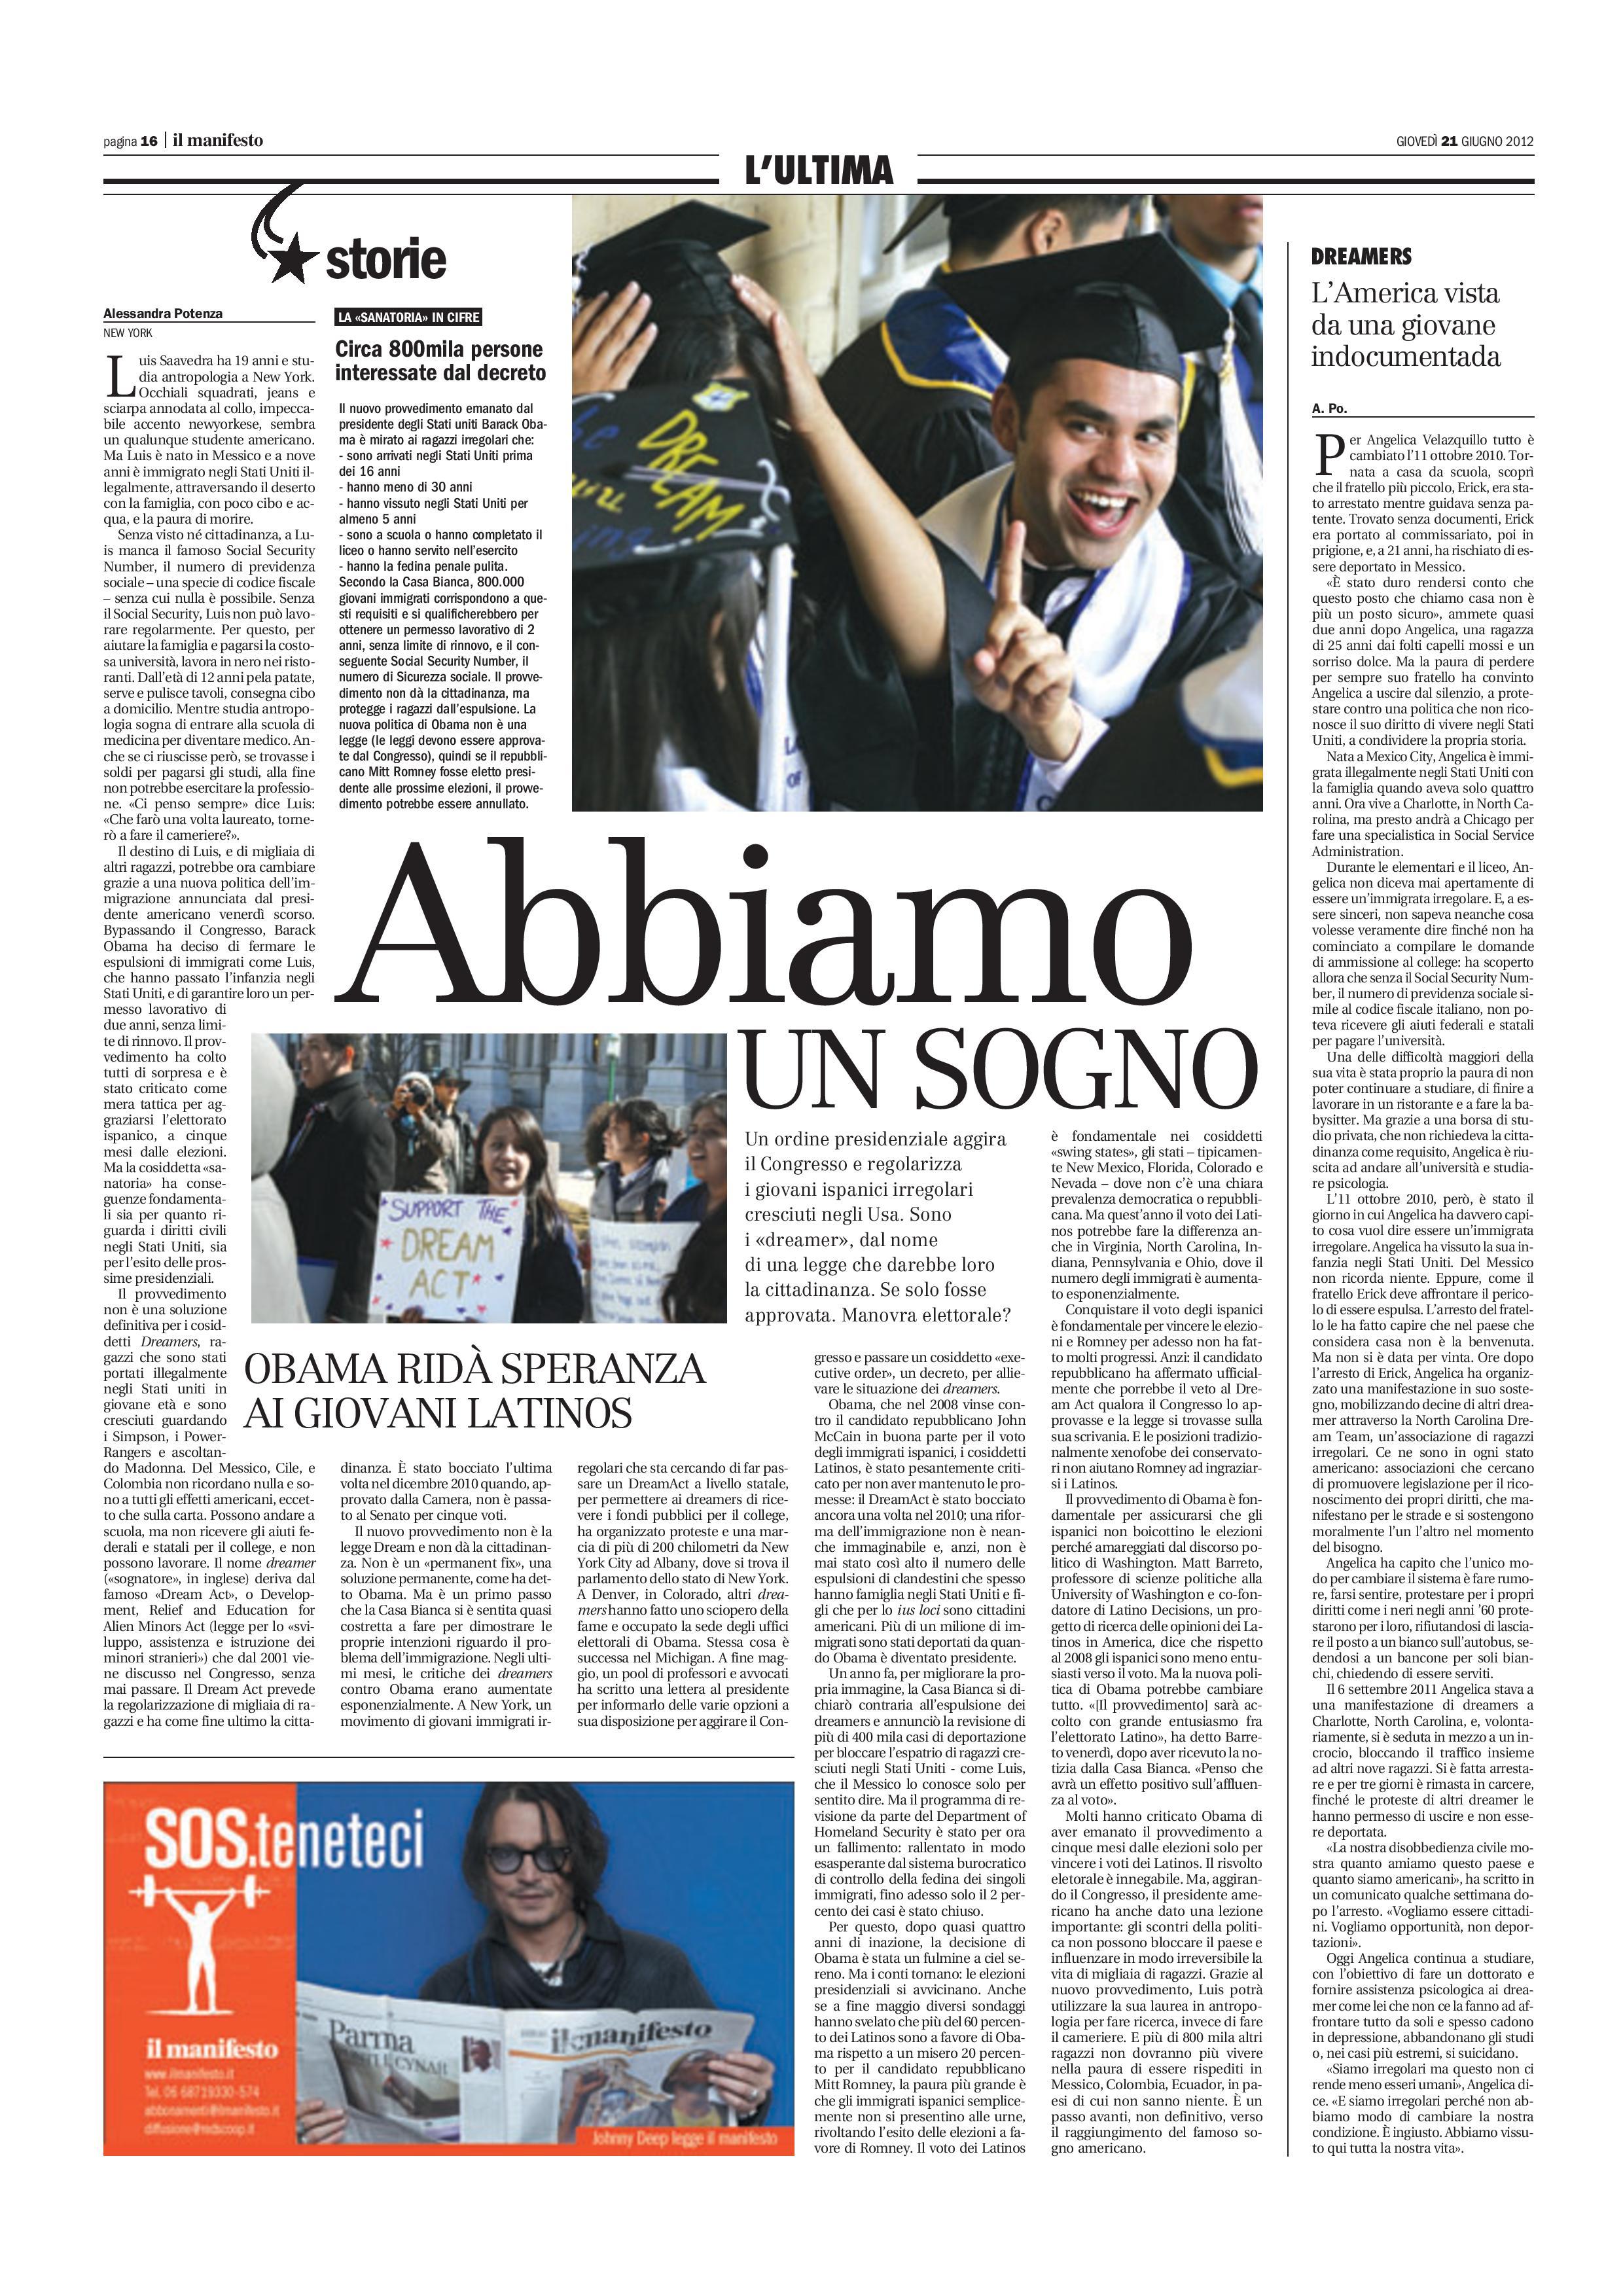 dream_act_manifesto_21.6.2012-page-001.jpg